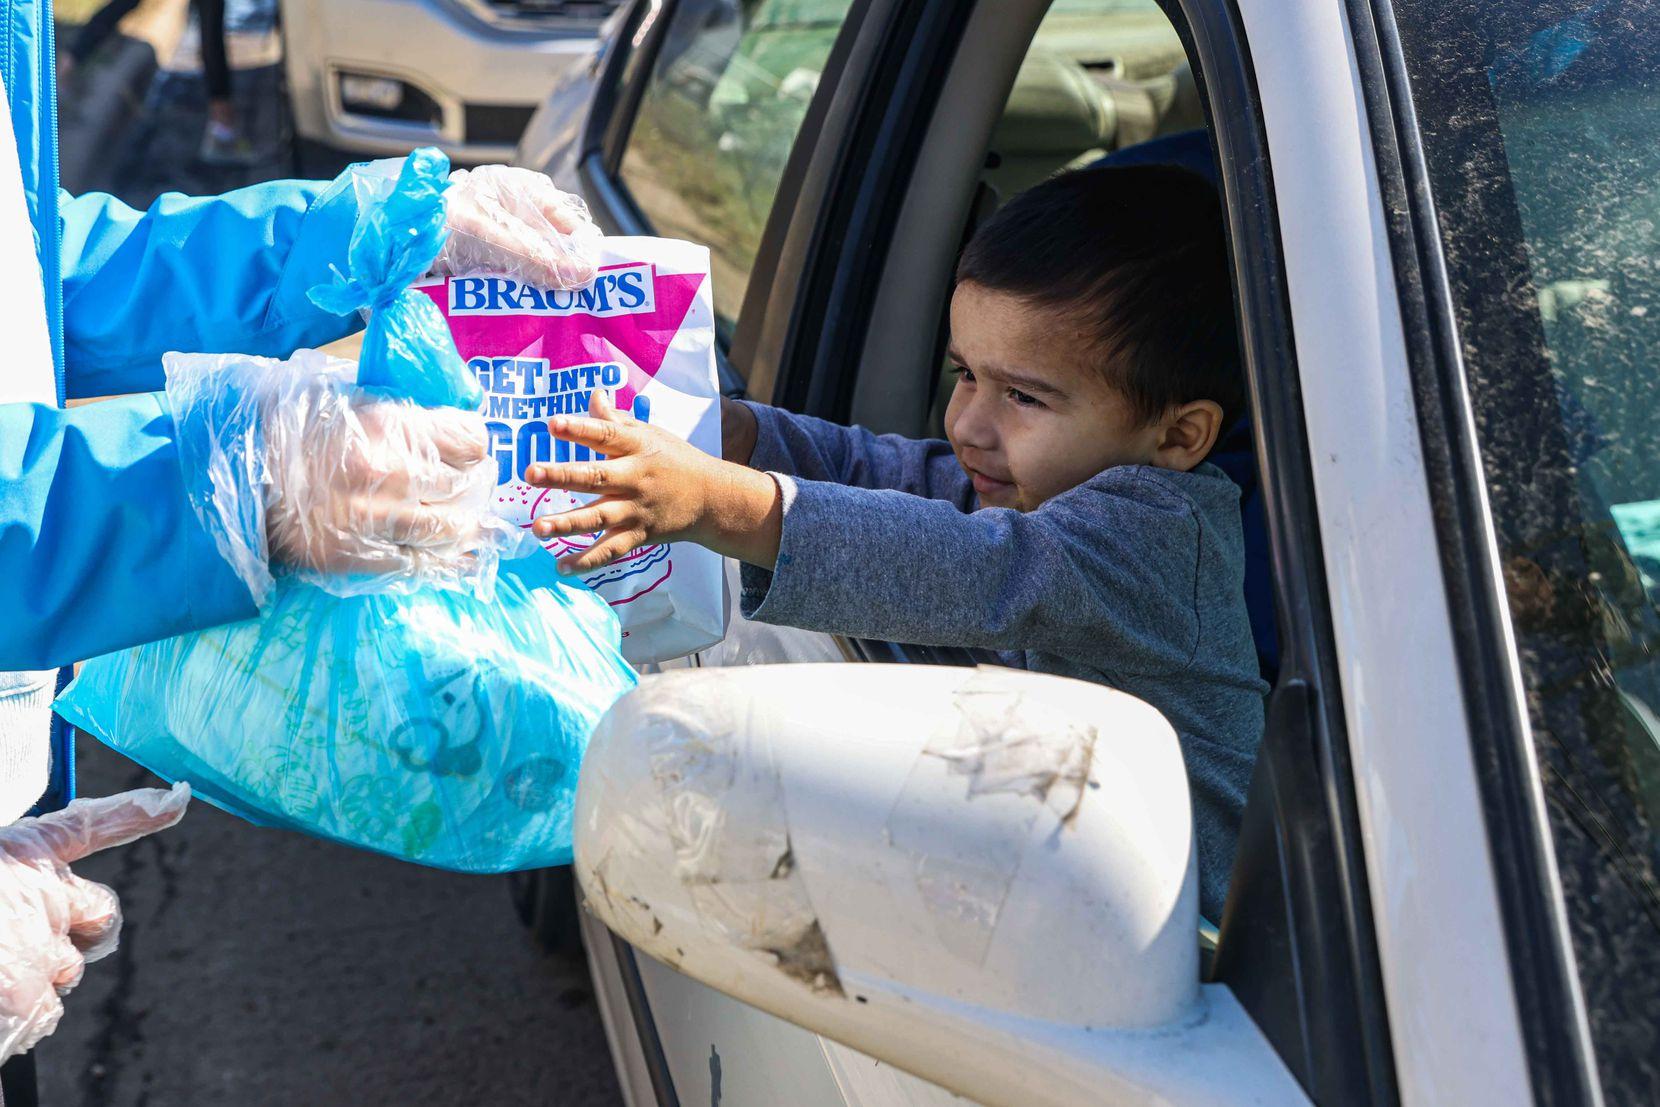 Adolfo Chavarria, 3, received food aid from volunteer Rachel Harper, 15, at the Ledbetter food pantry in Iglesia El Calvario on Friday.